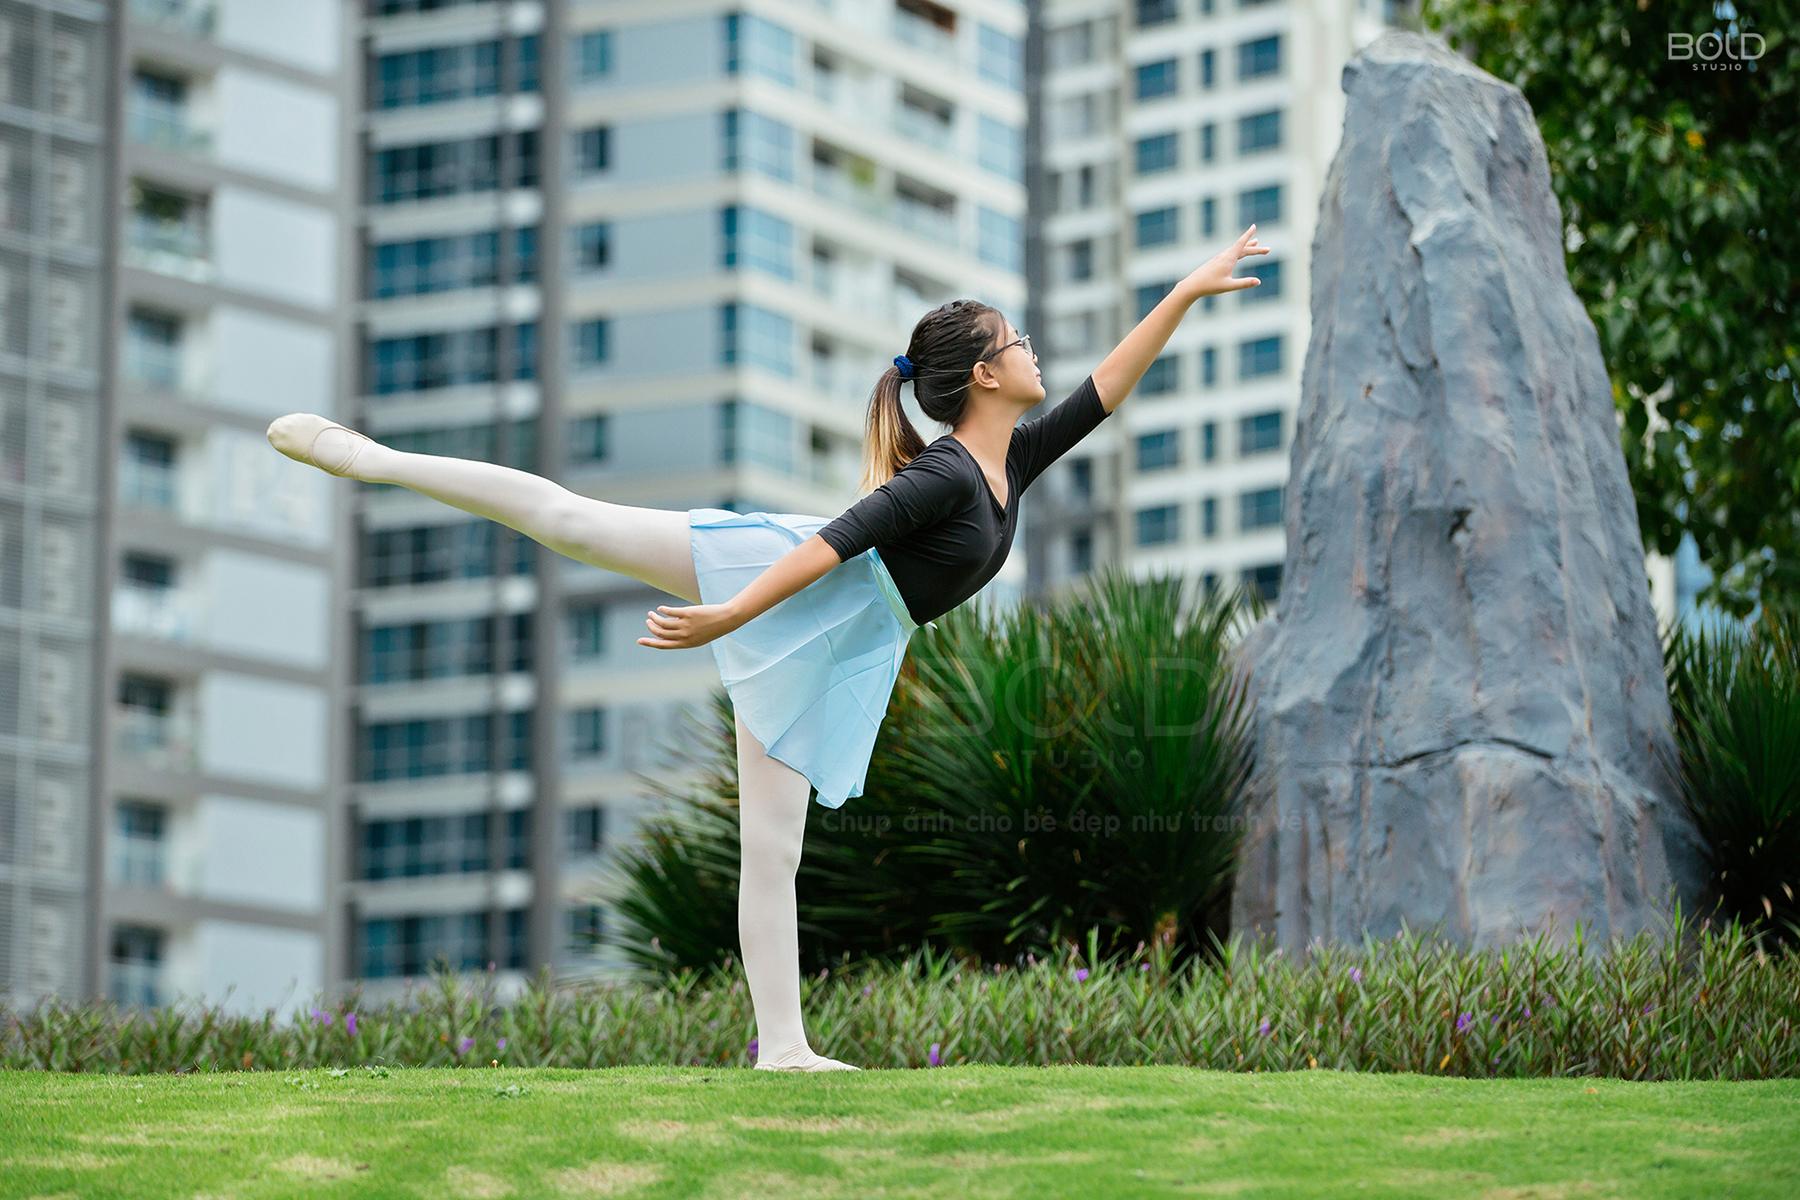 chụp ảnh múa ballet